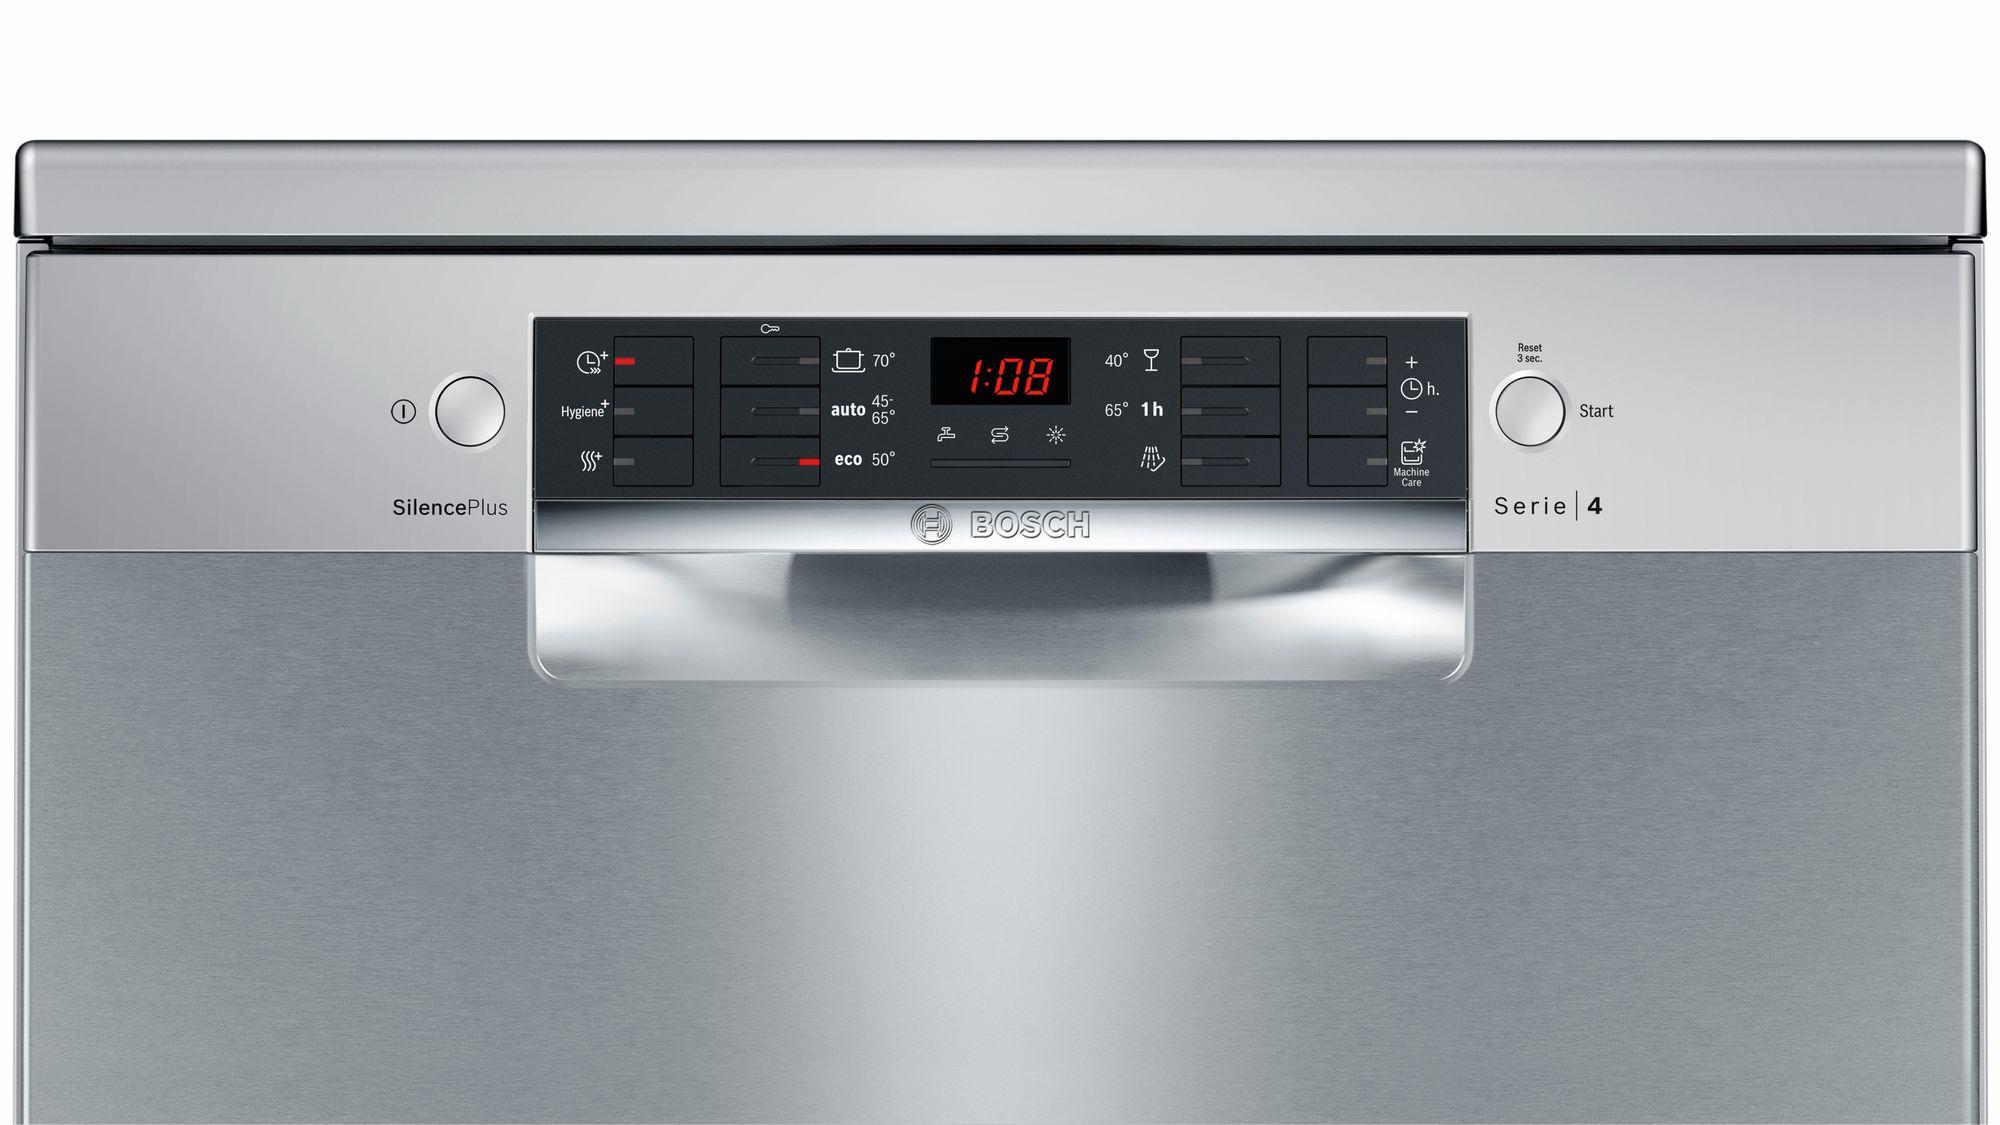 Serie | 4 Silence Plus mašina za pranje sudova, 60 cm samostalna mašina za pranje sudova, Silver inox